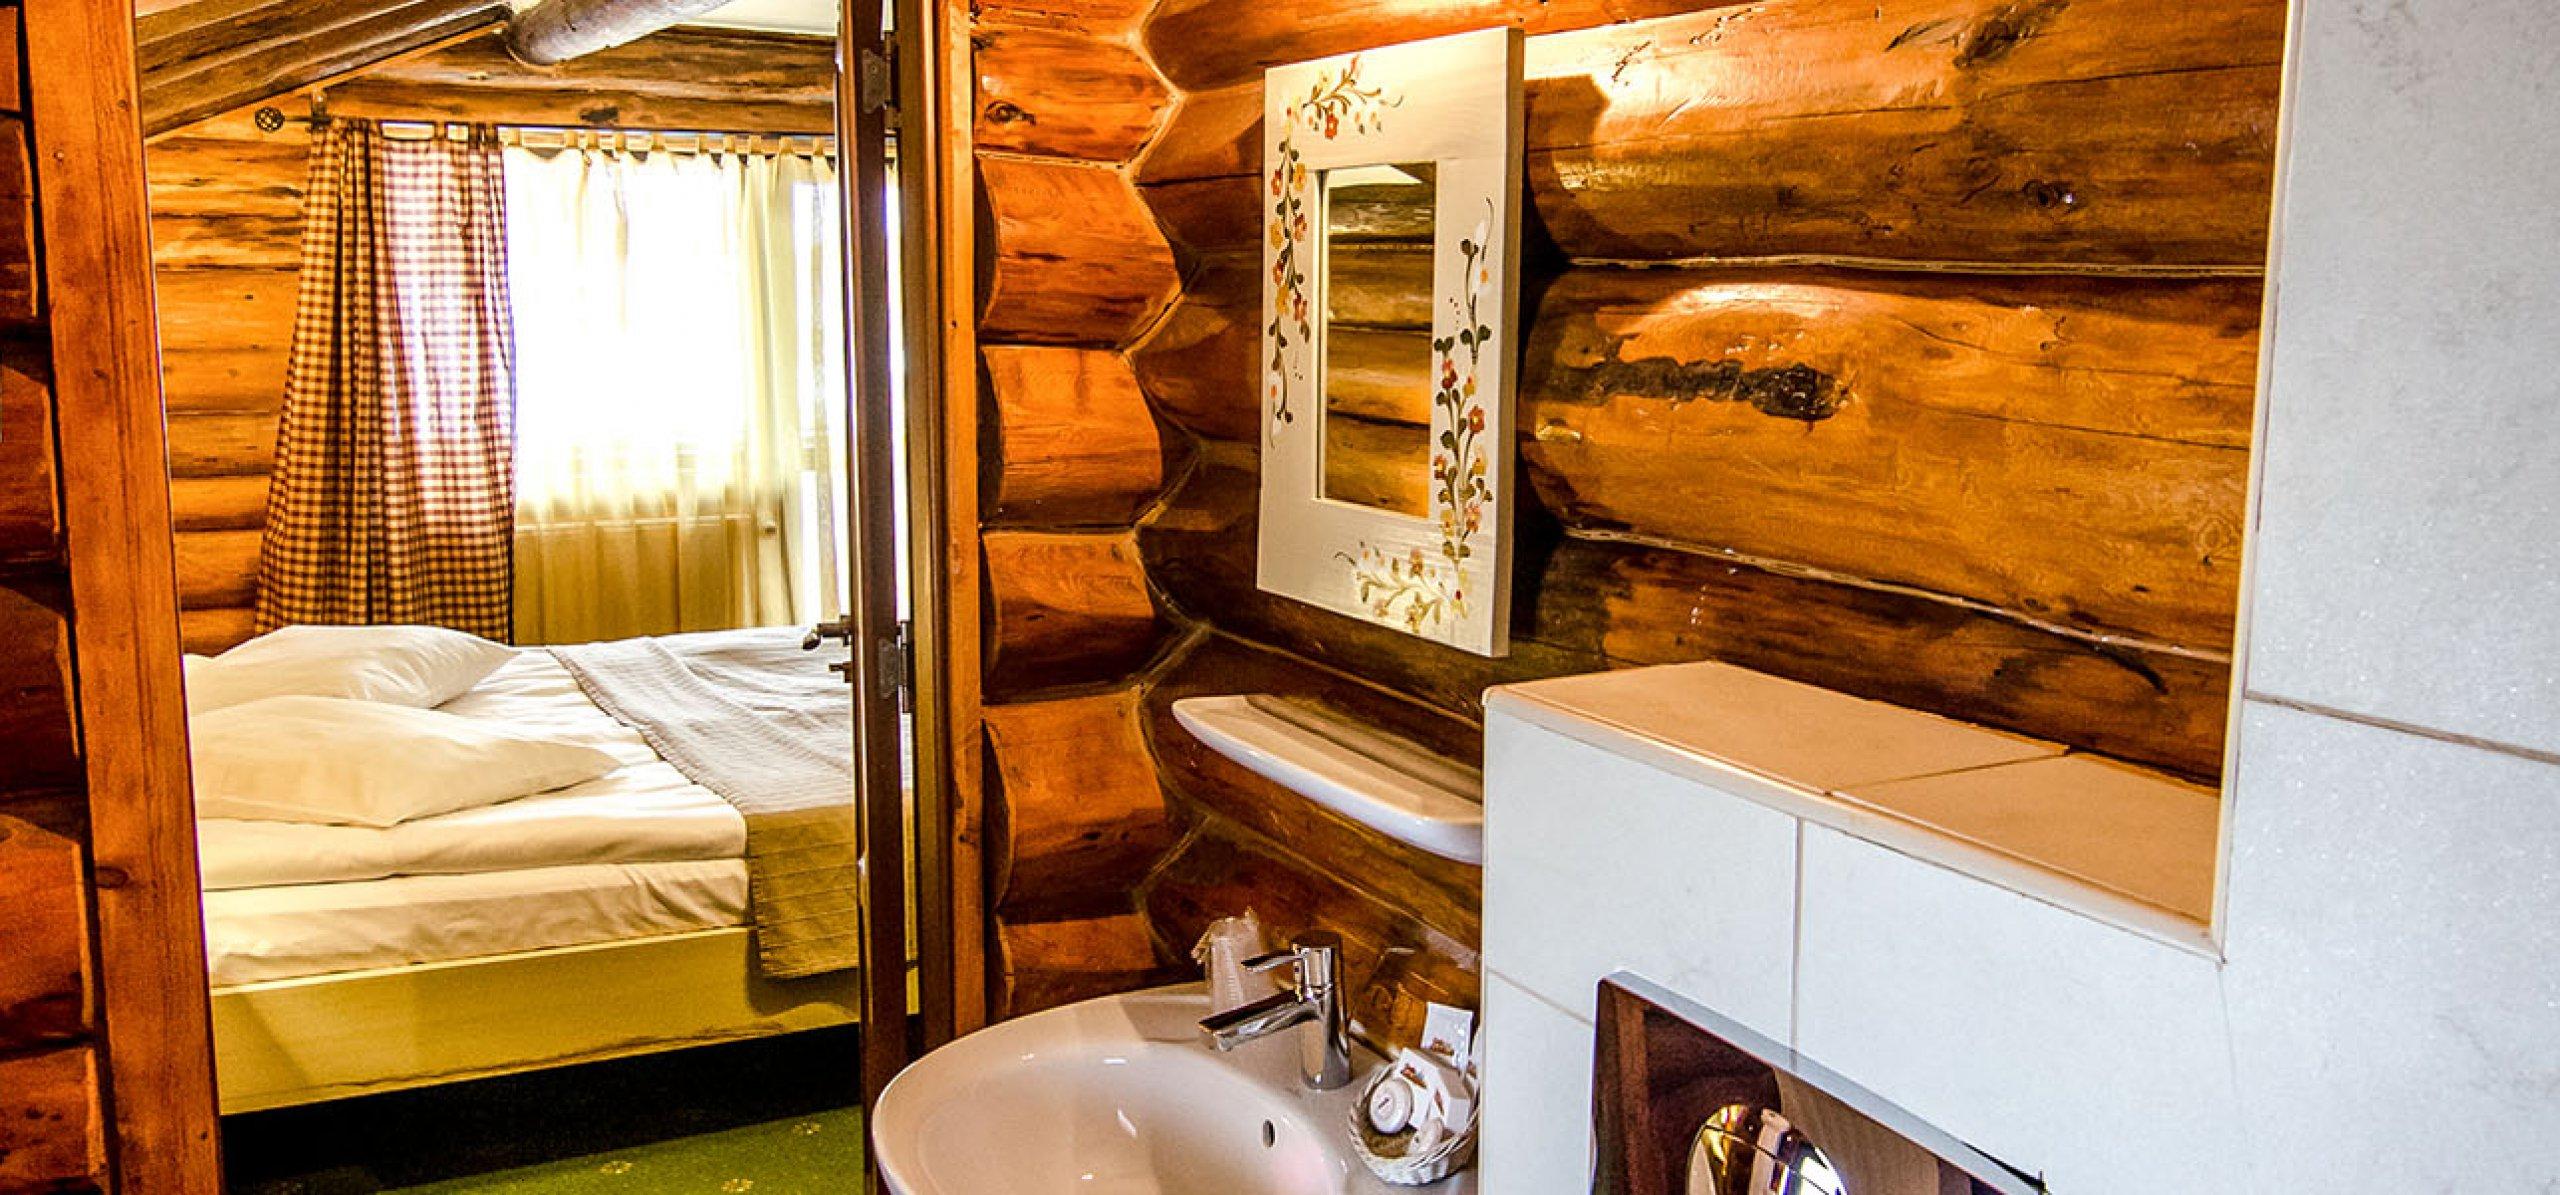 rustic-grup-sanitar-camera-dubla-vila-carpenul-cheile-gradistei-fundata